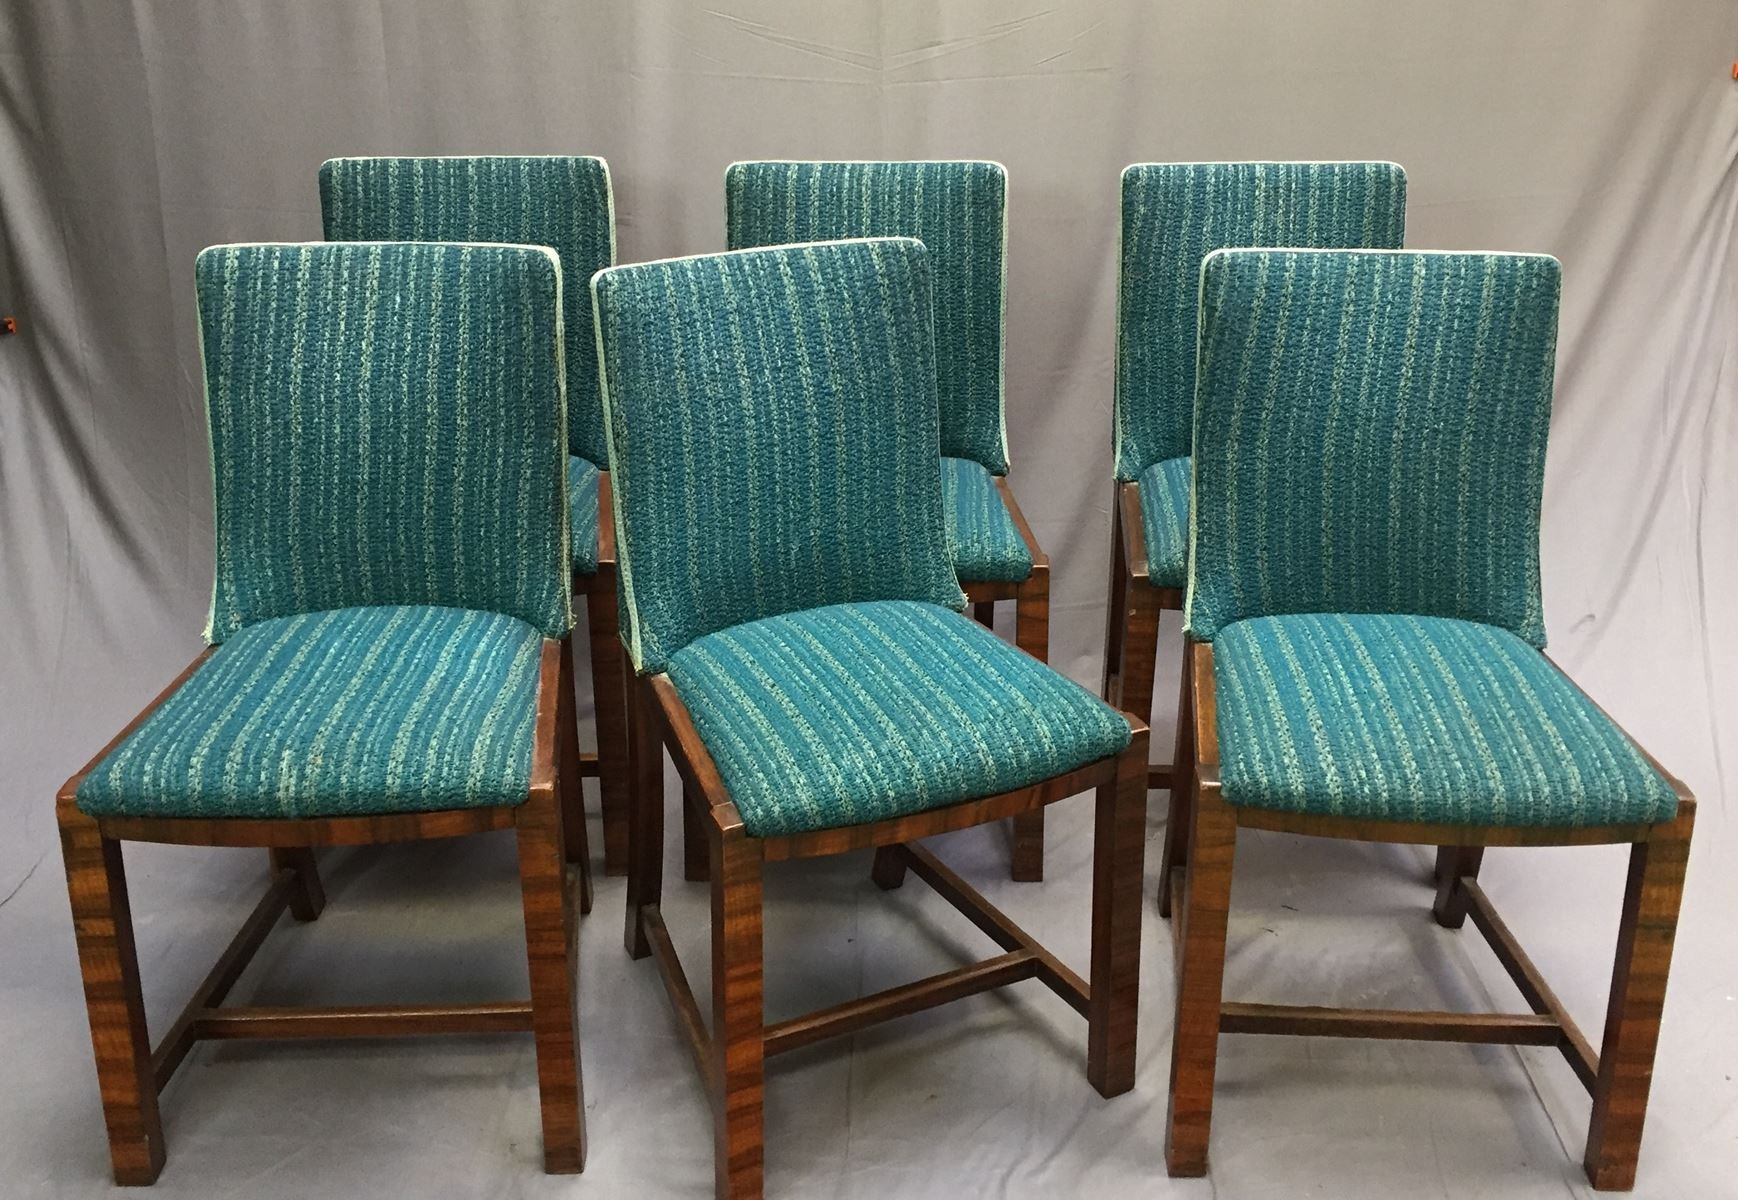 Vintage mahagoni esszimmerst hle 6er set bei pamono kaufen - Esszimmerstuhle 6er set ...